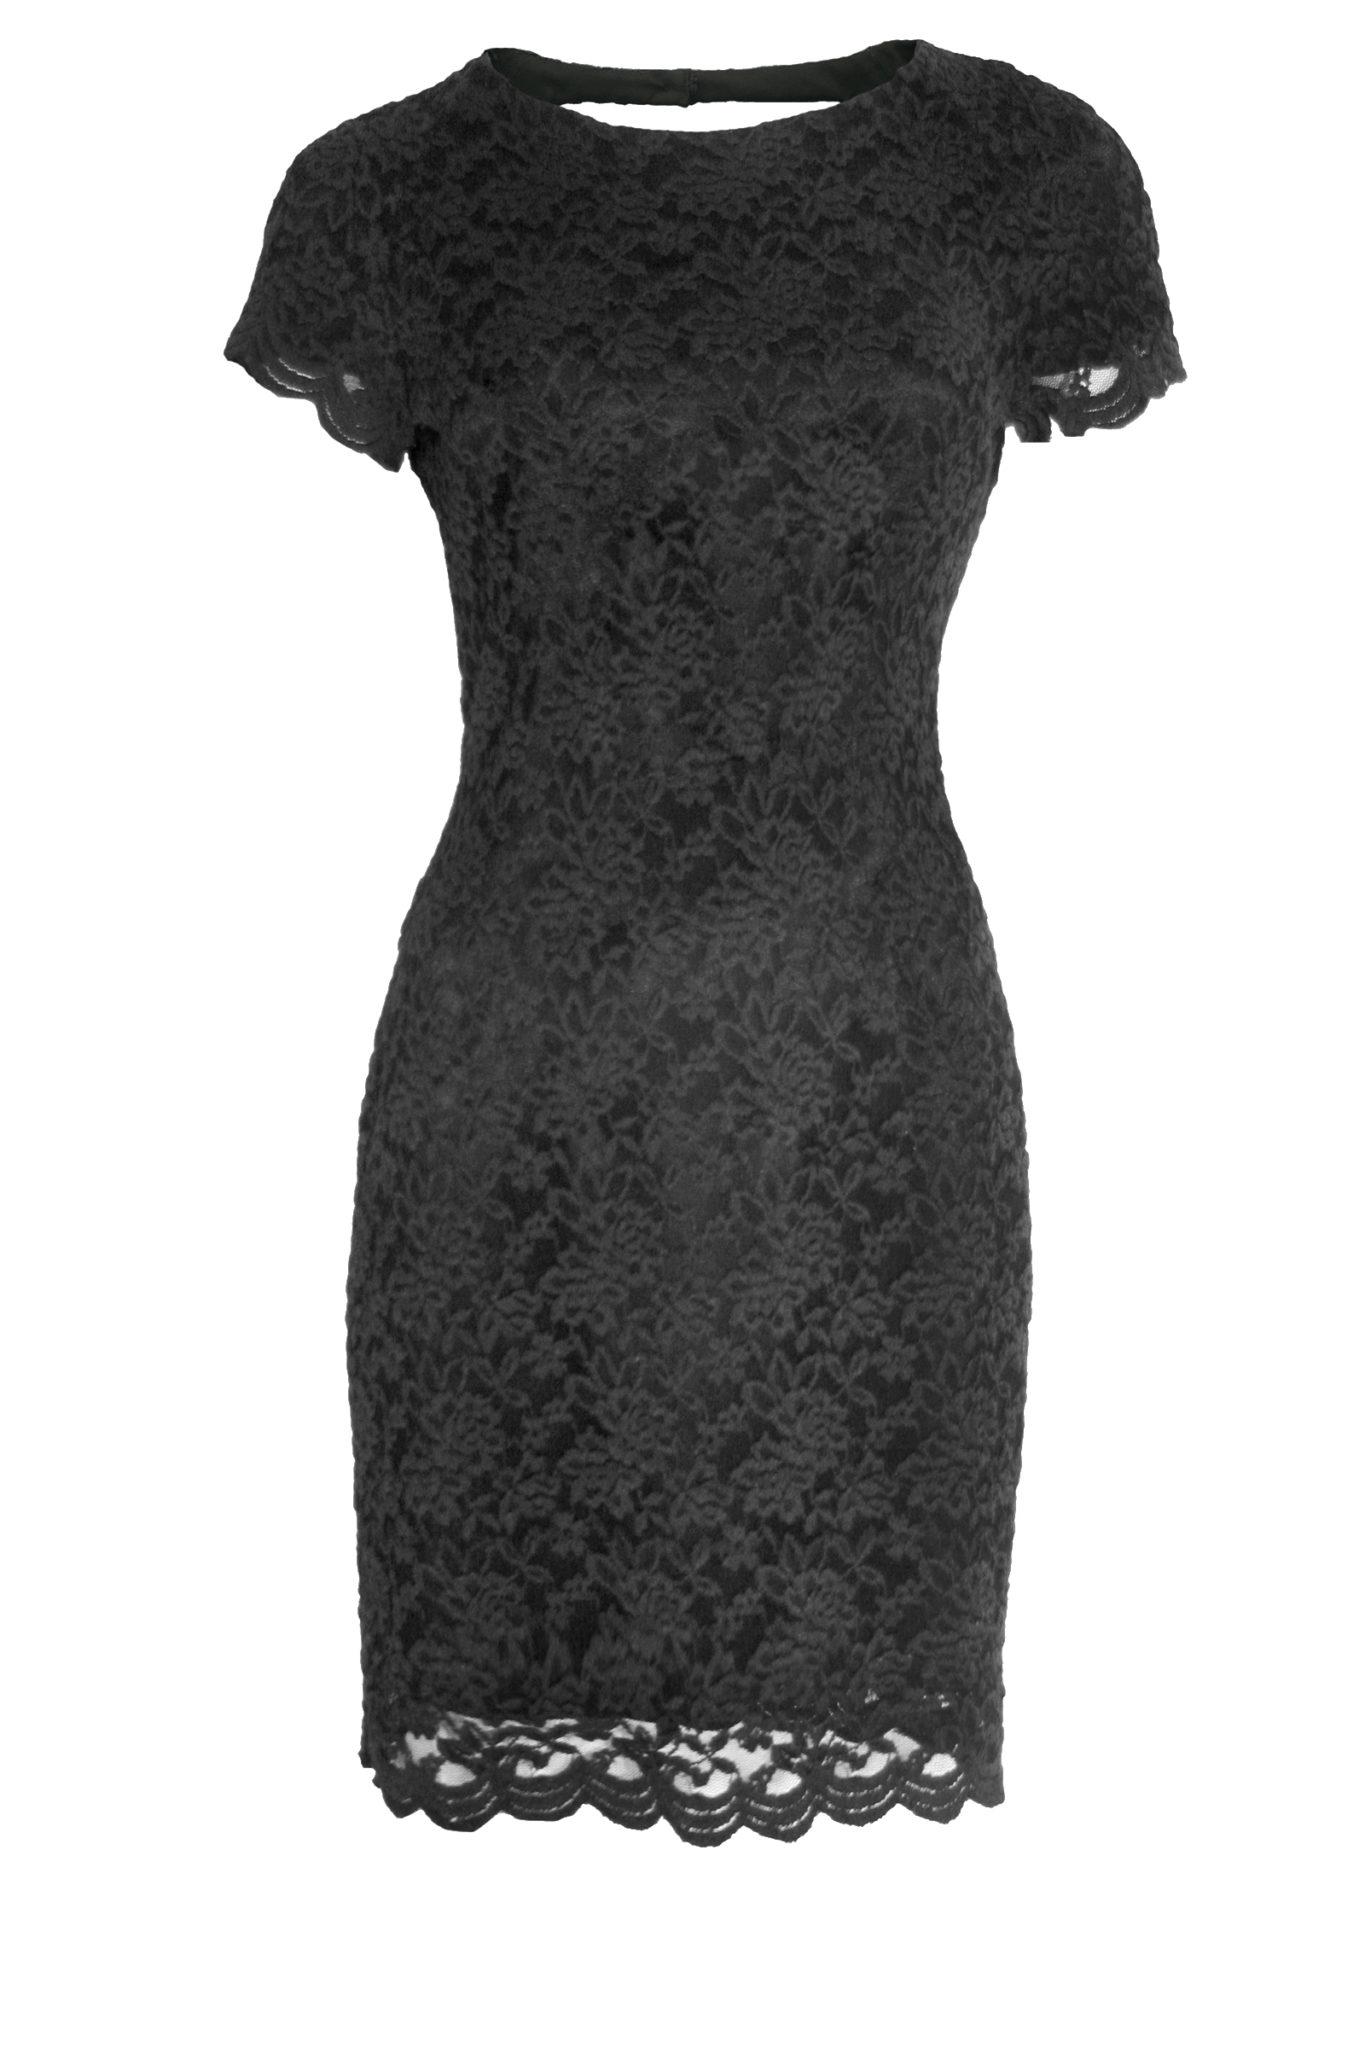 1371c7866b69 Caprice Sequin Dress Black Teal